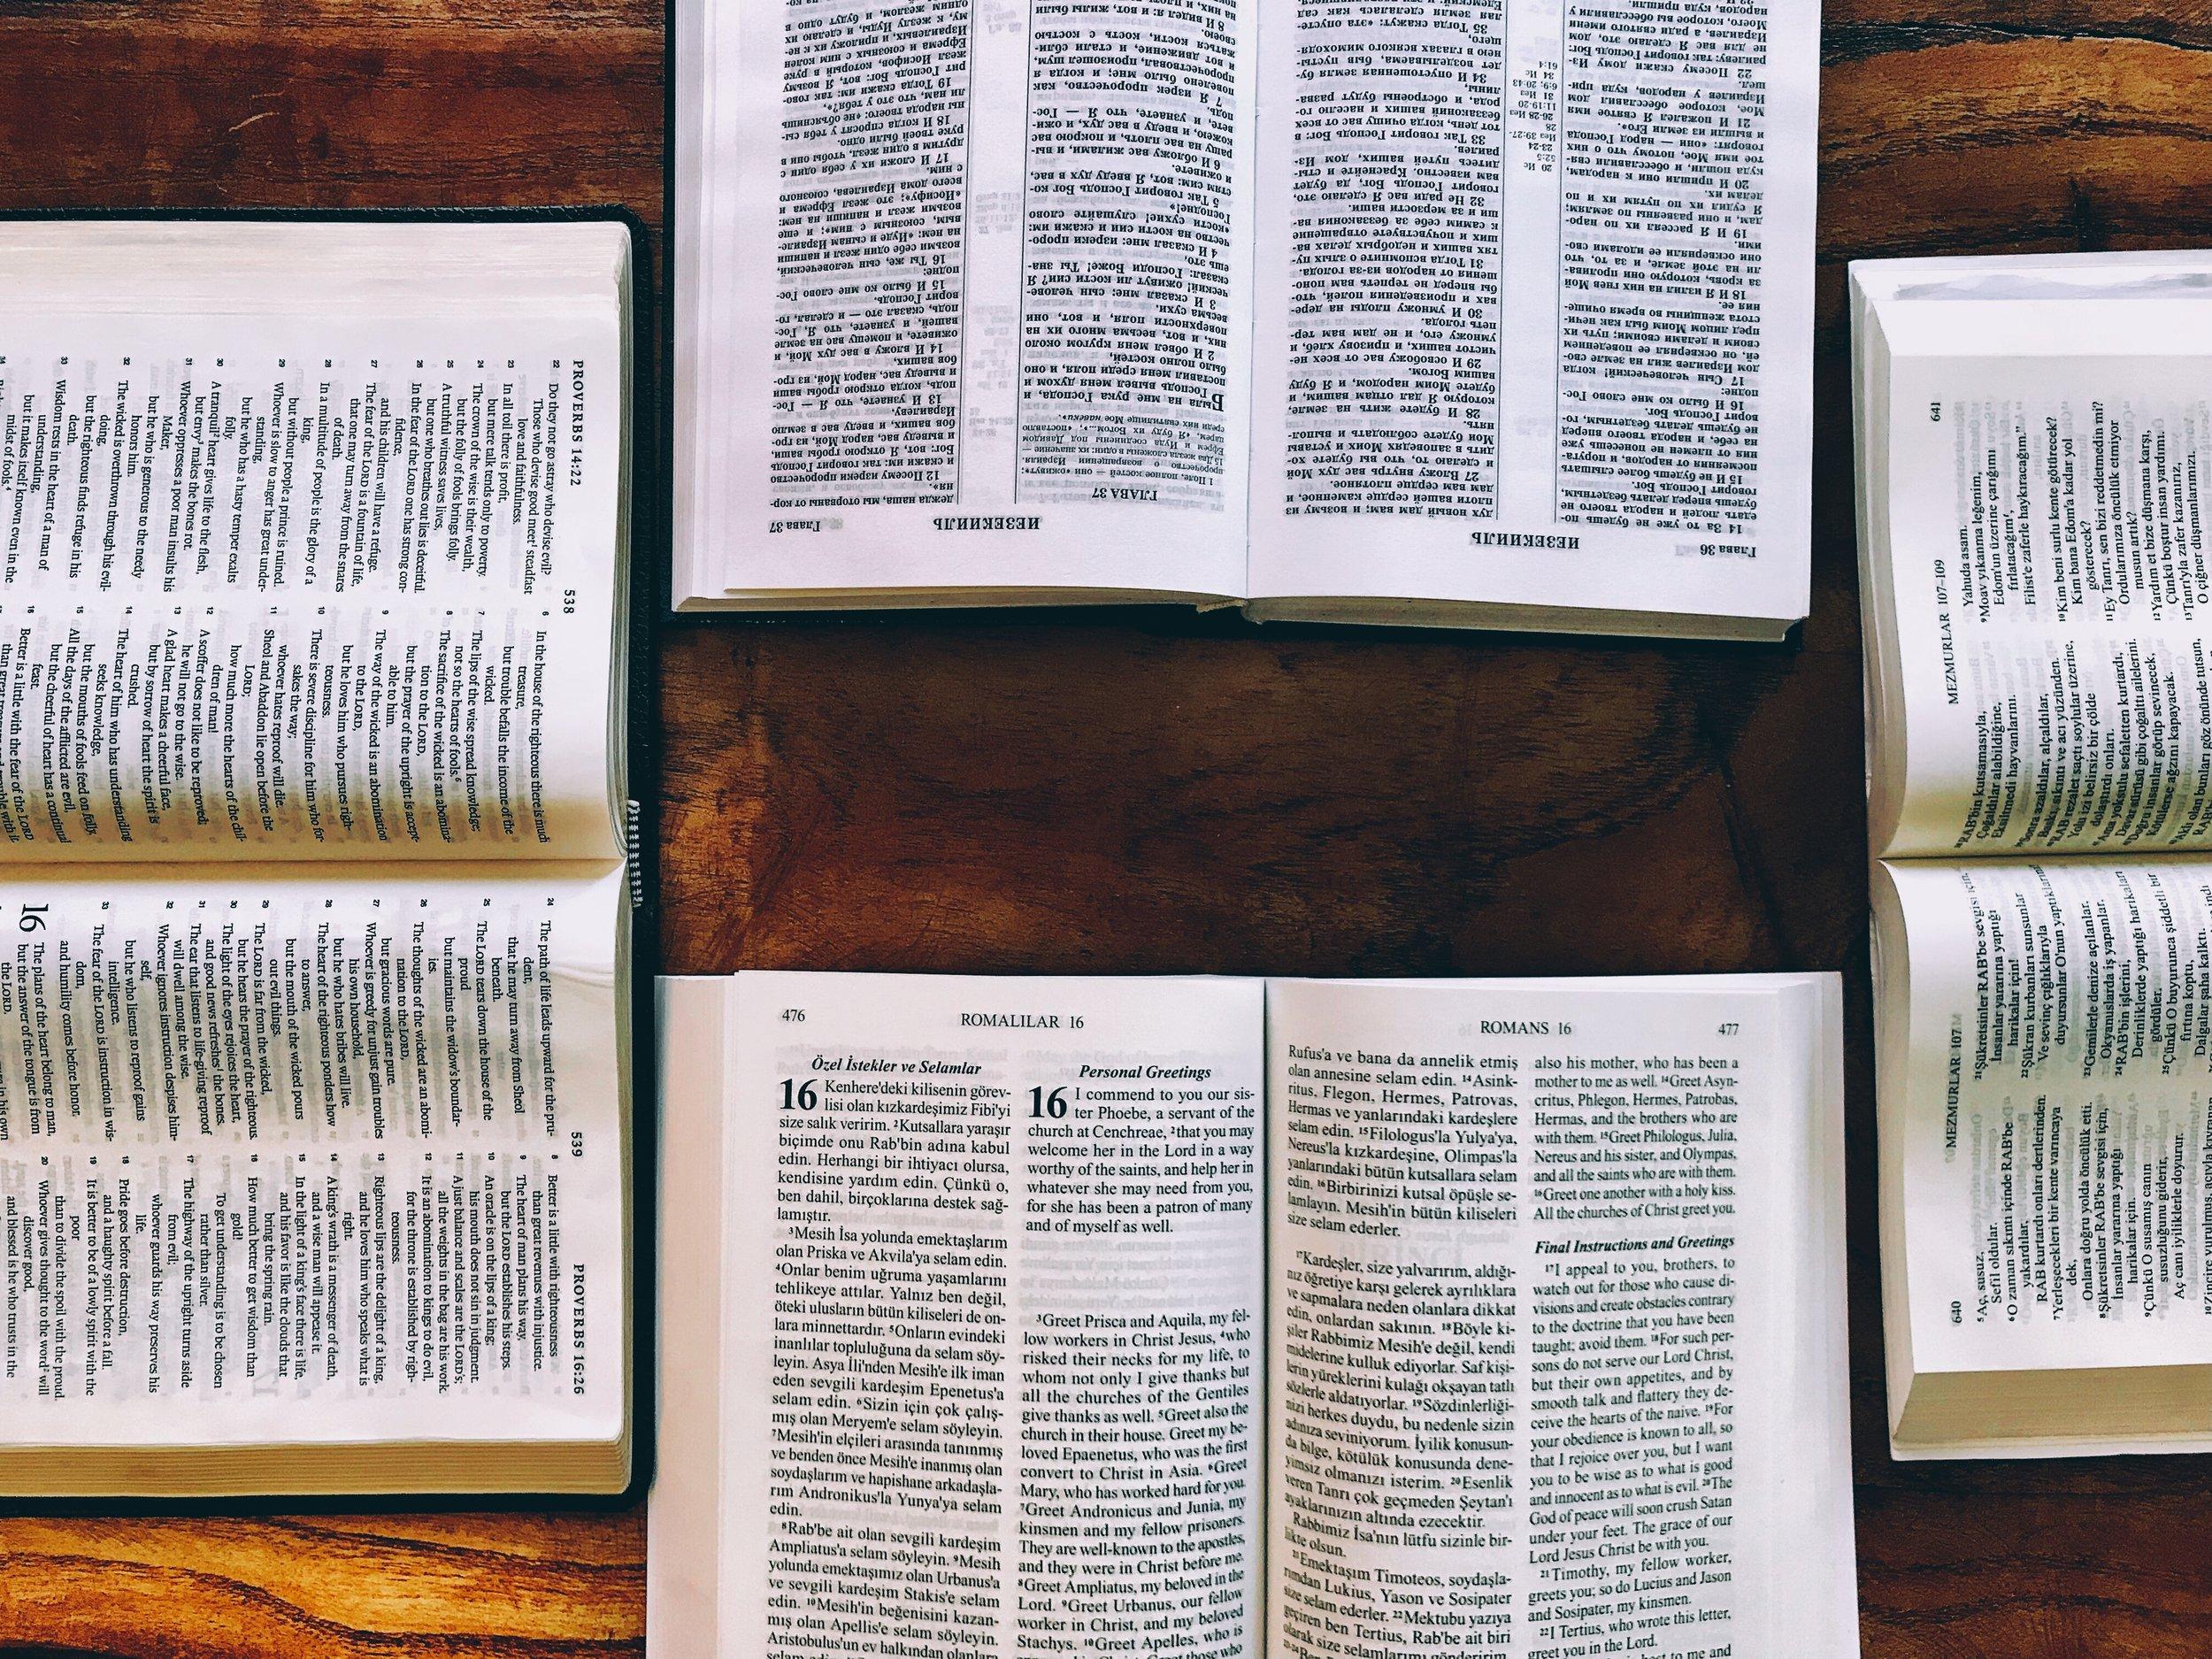 FHK Bibles